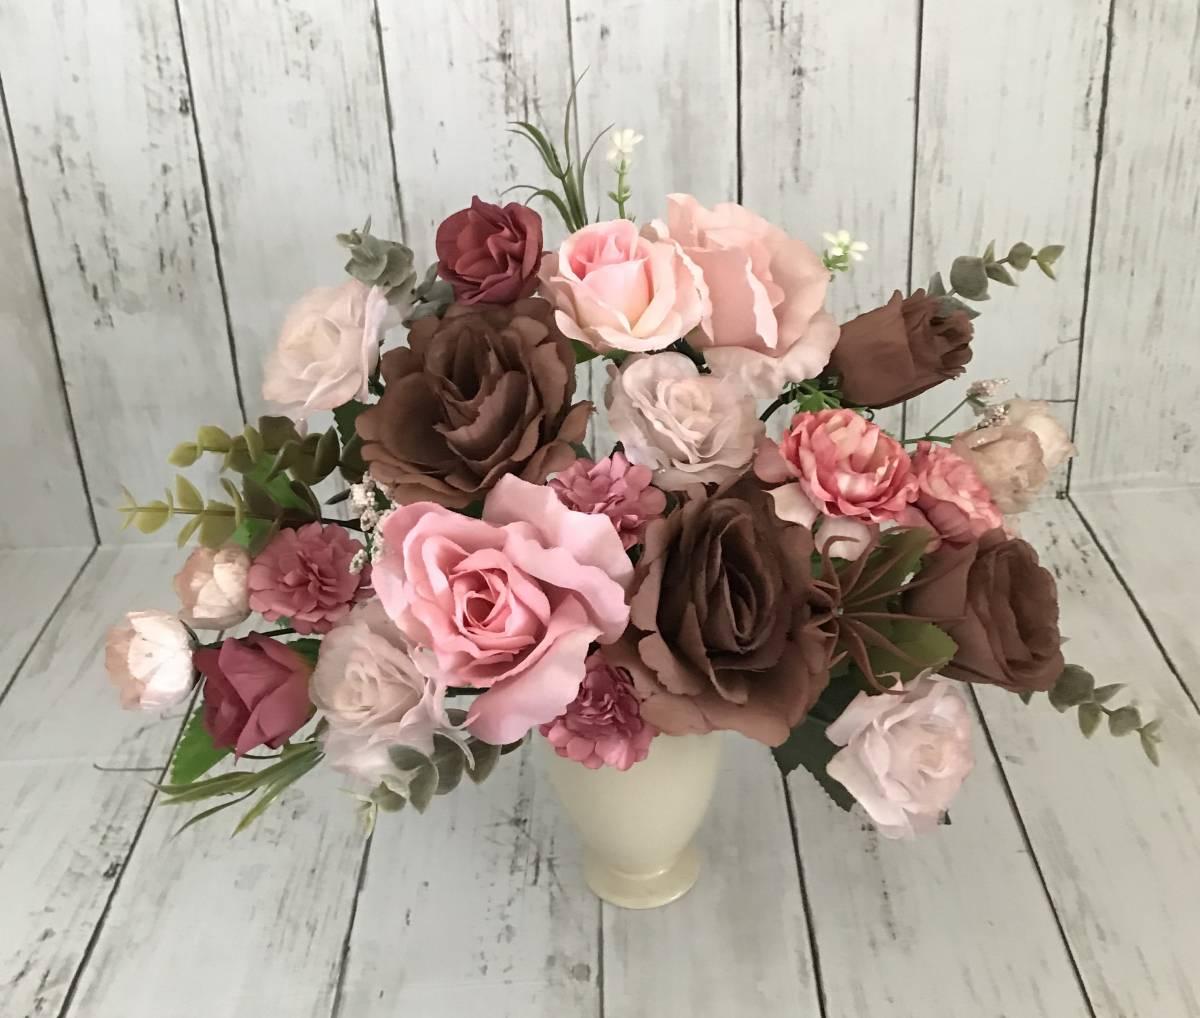 pretty flower����SALE�I�x�[�W���Ԋ�`���R���[�g�u���E���ƃ~���N�e�B�[�s���N���K�N�t�F�~�j���A�����W Image4